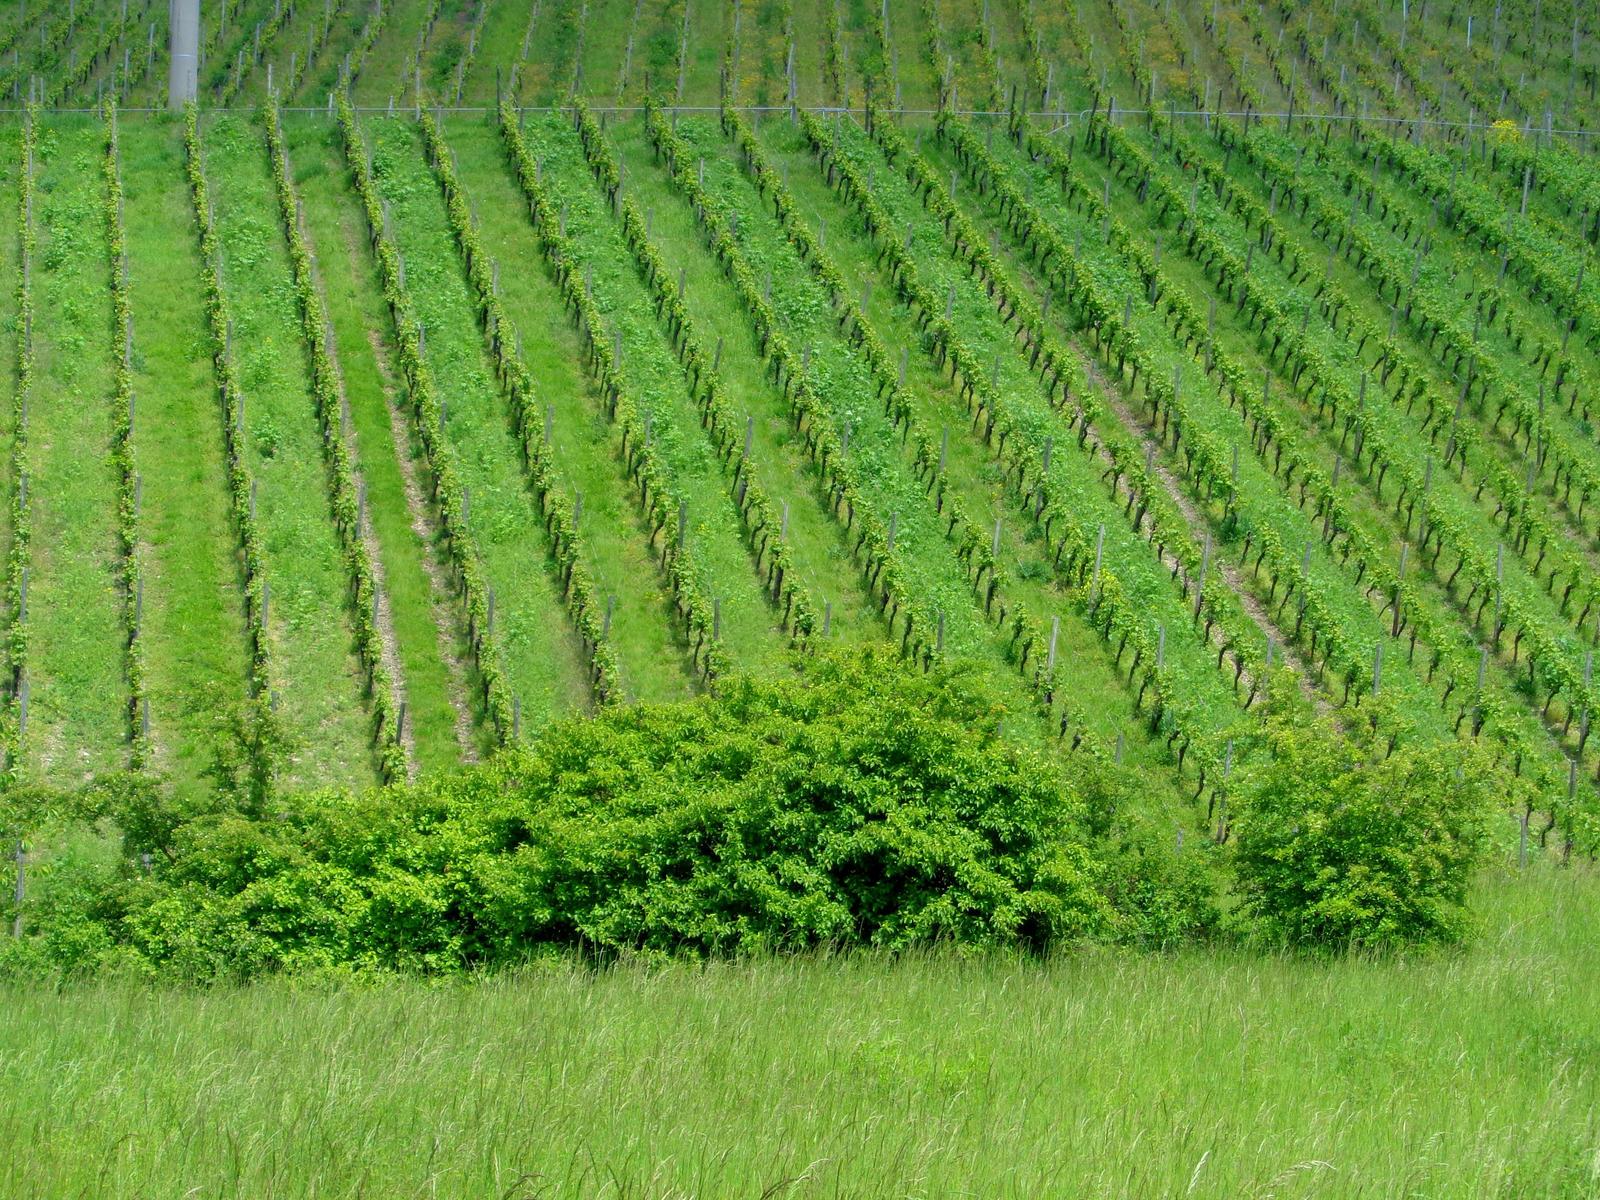 franconian vineyard by Mittelfranke